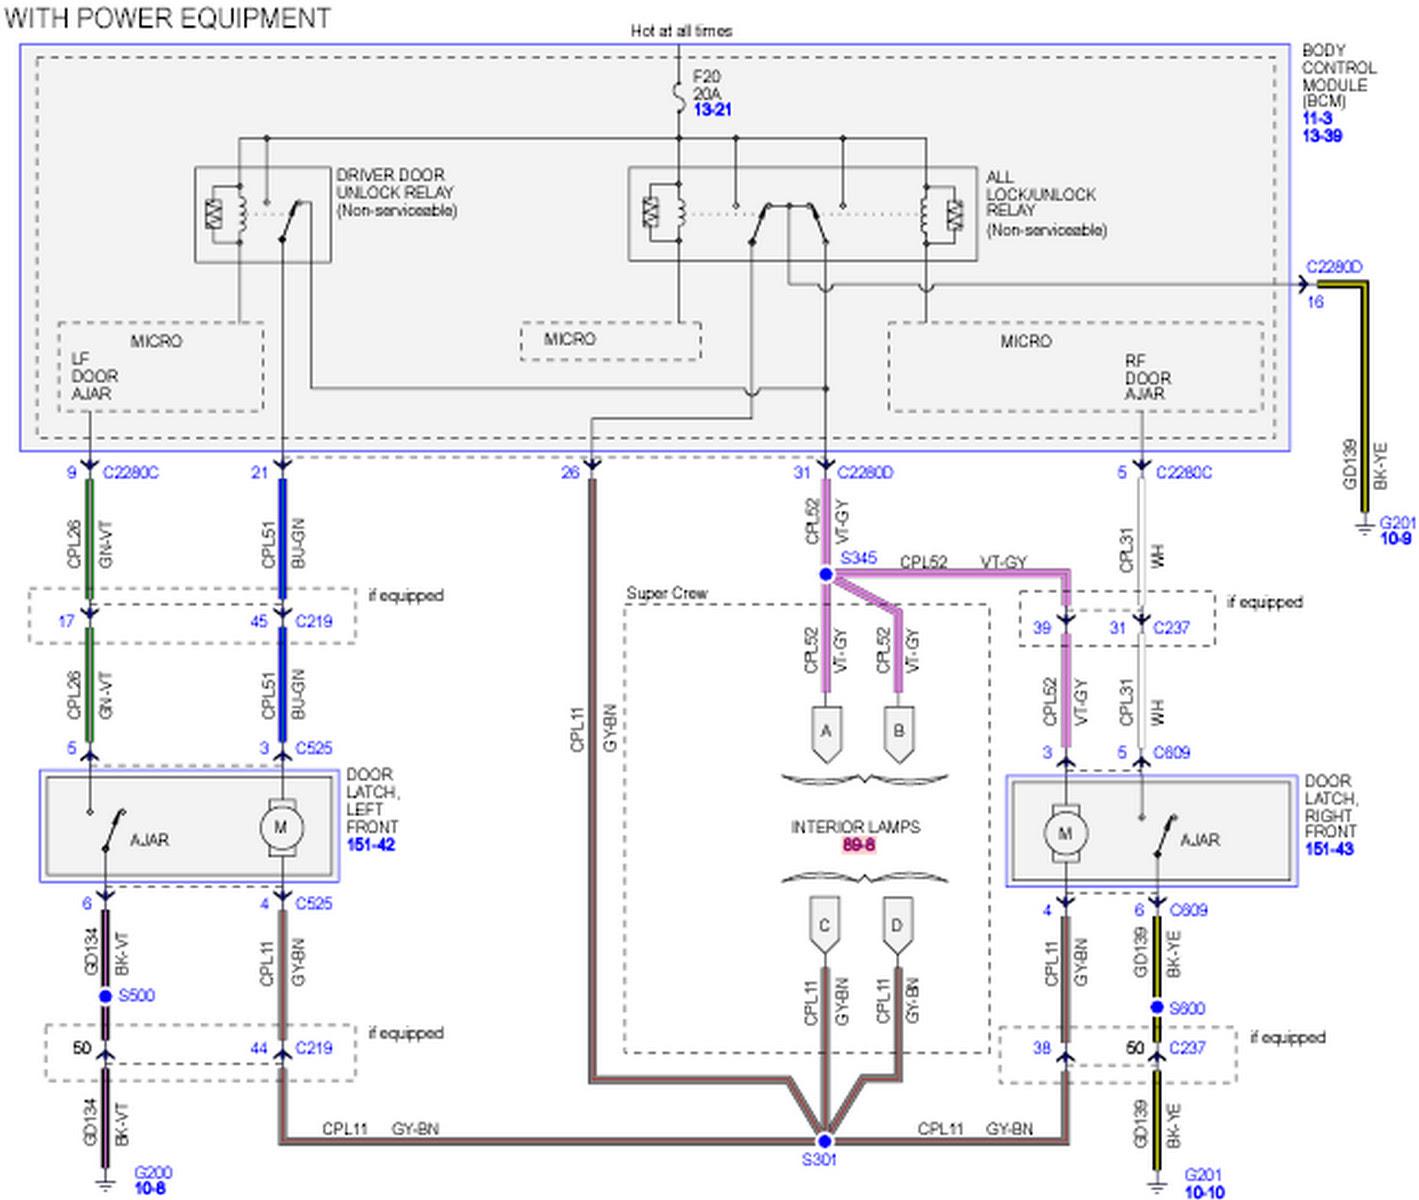 Diagram 2013 Ford Edge Radio Wiring Diagram Full Version Hd Quality Wiring Diagram Diagramscaves Tomari It